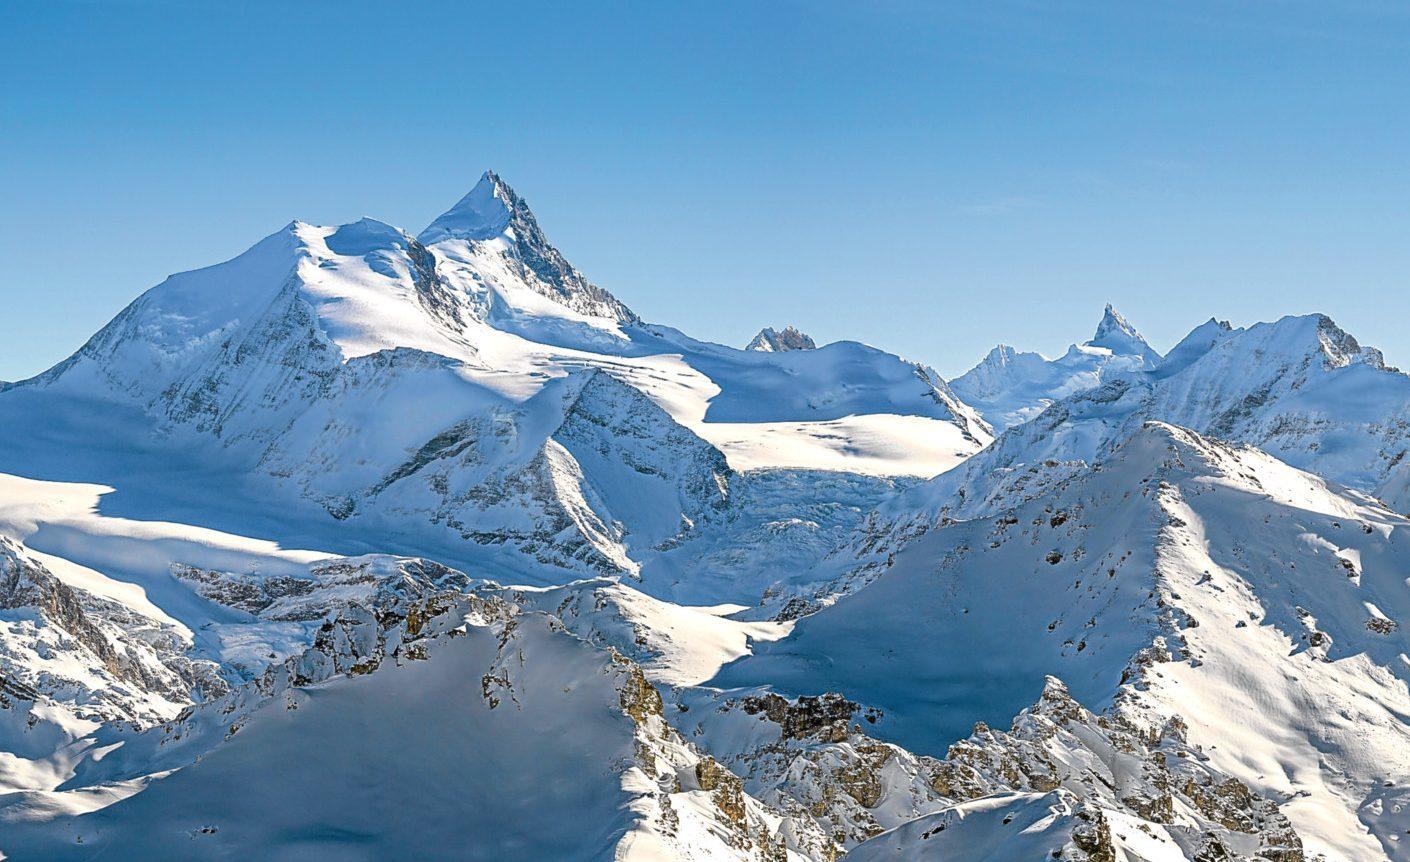 The breath-taking Swiss Alps.